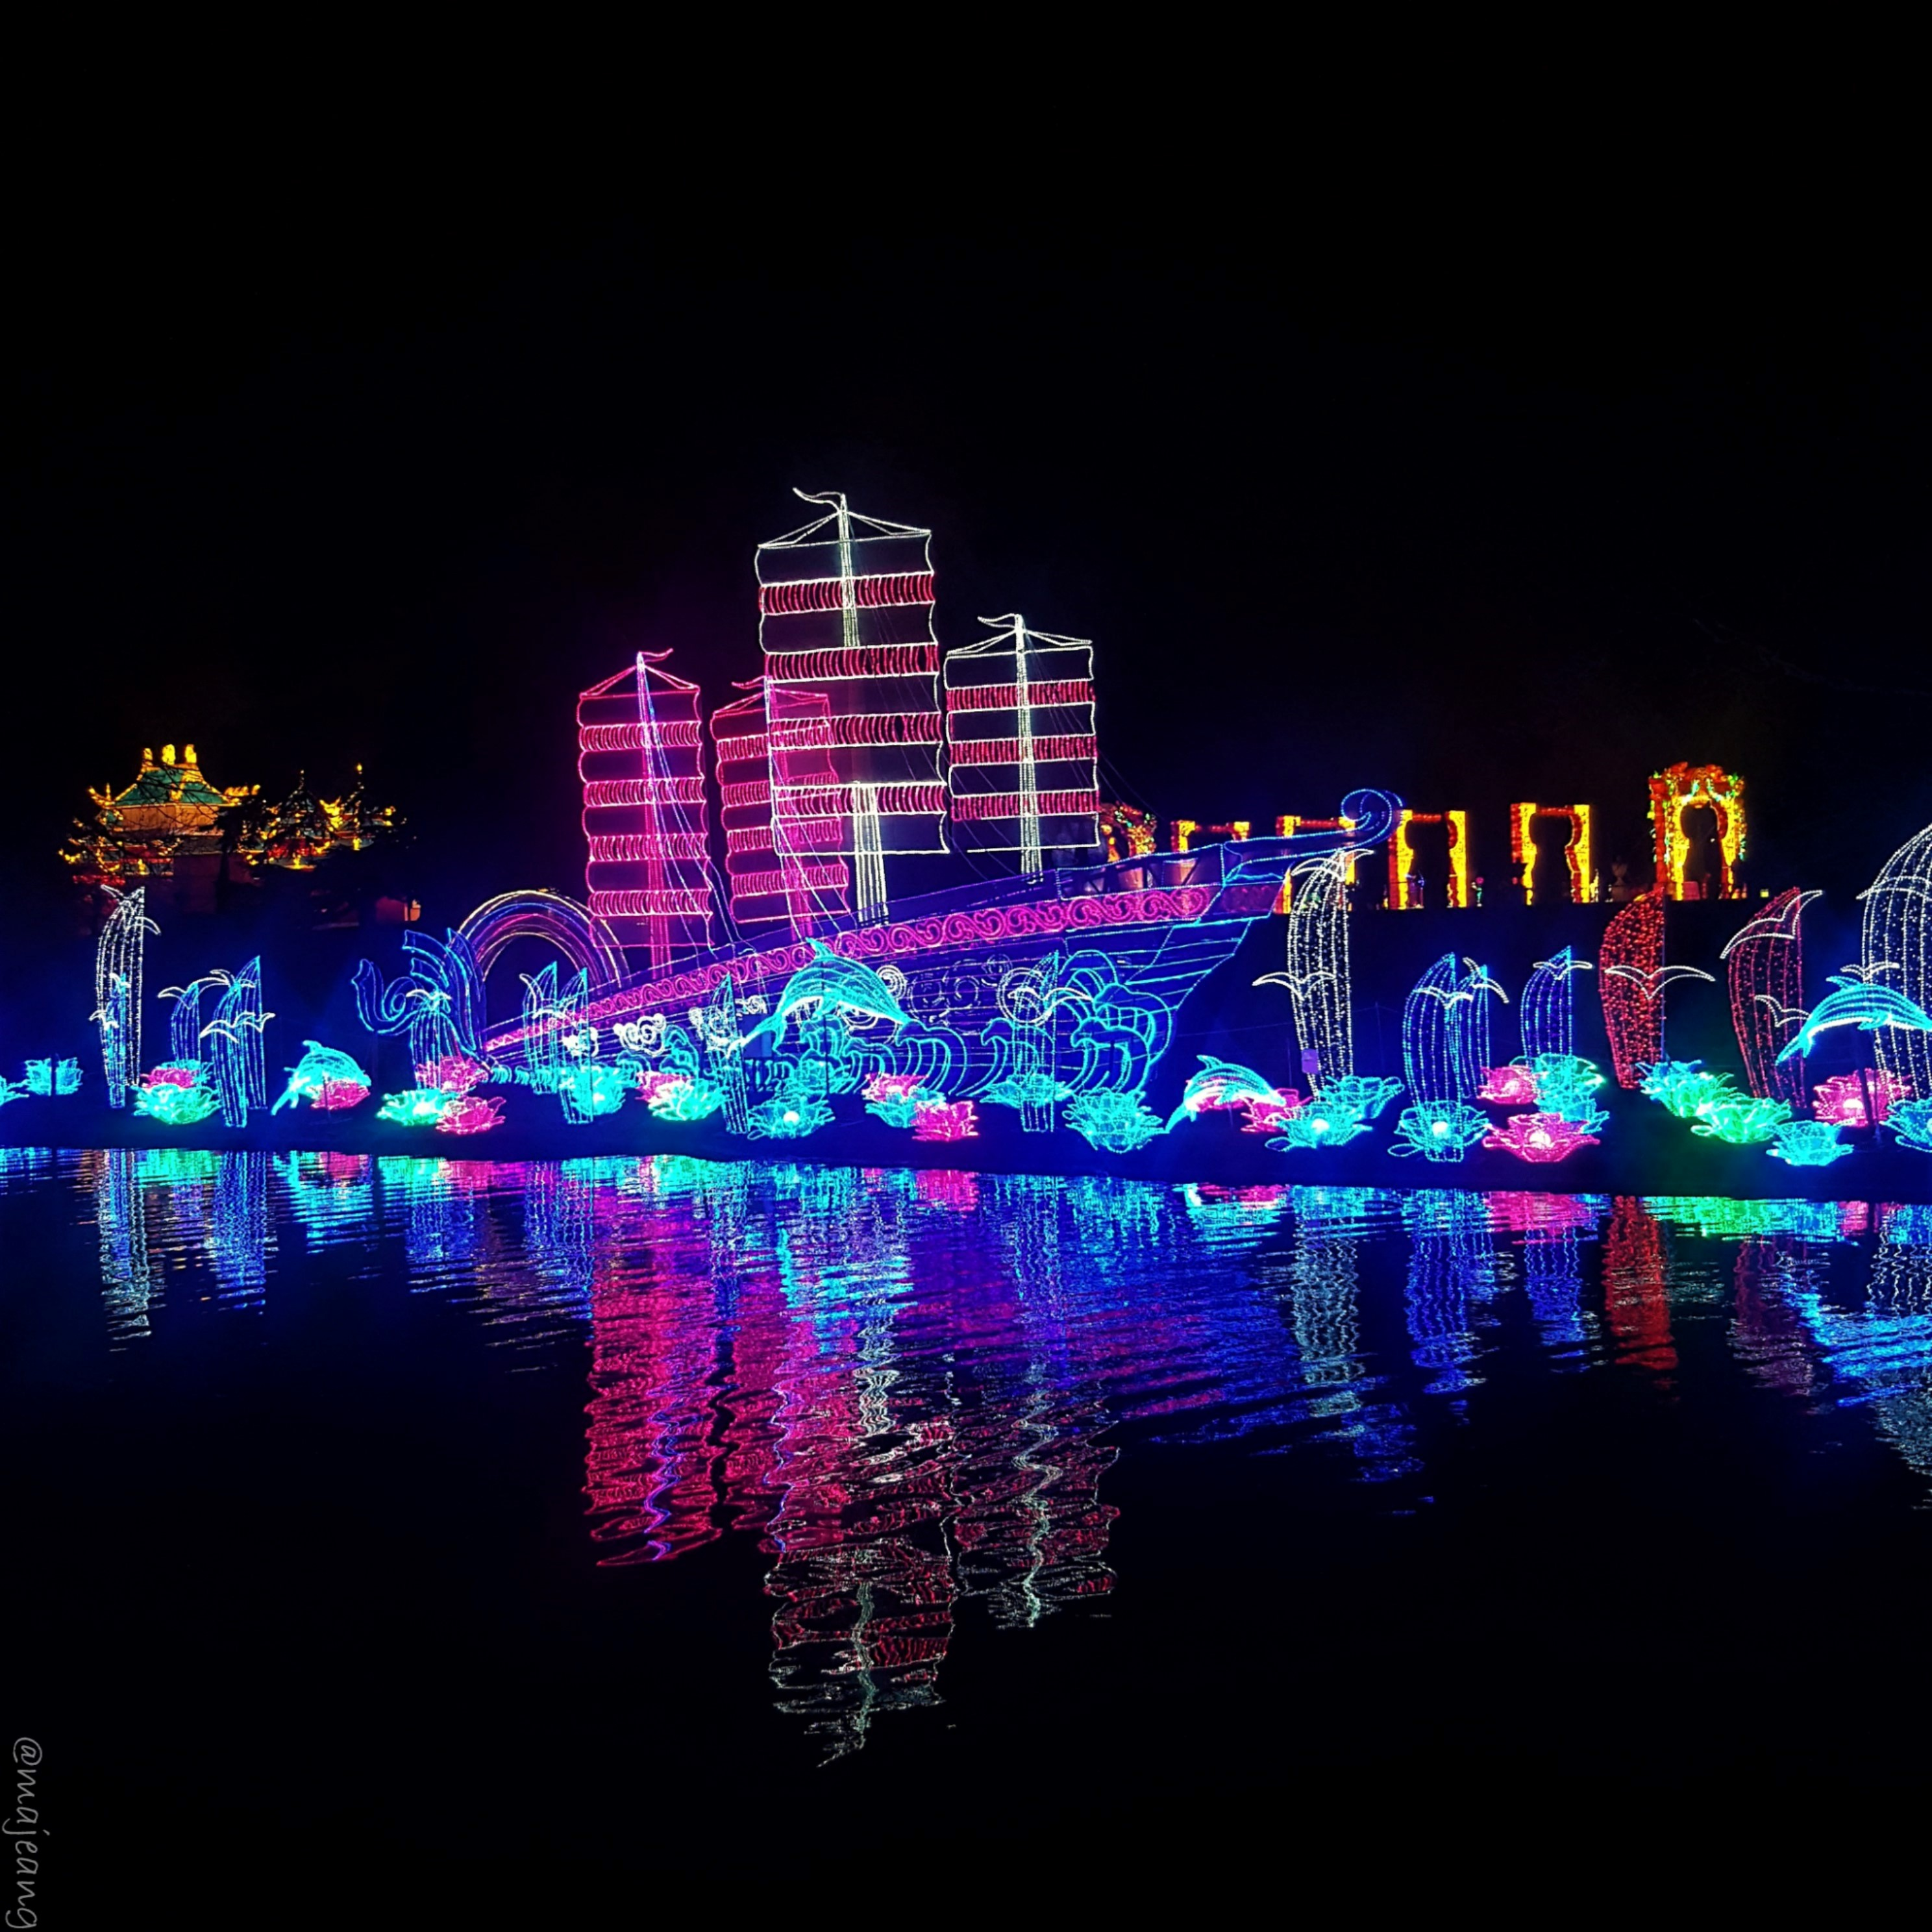 lantern festival feature image www.majeang.com